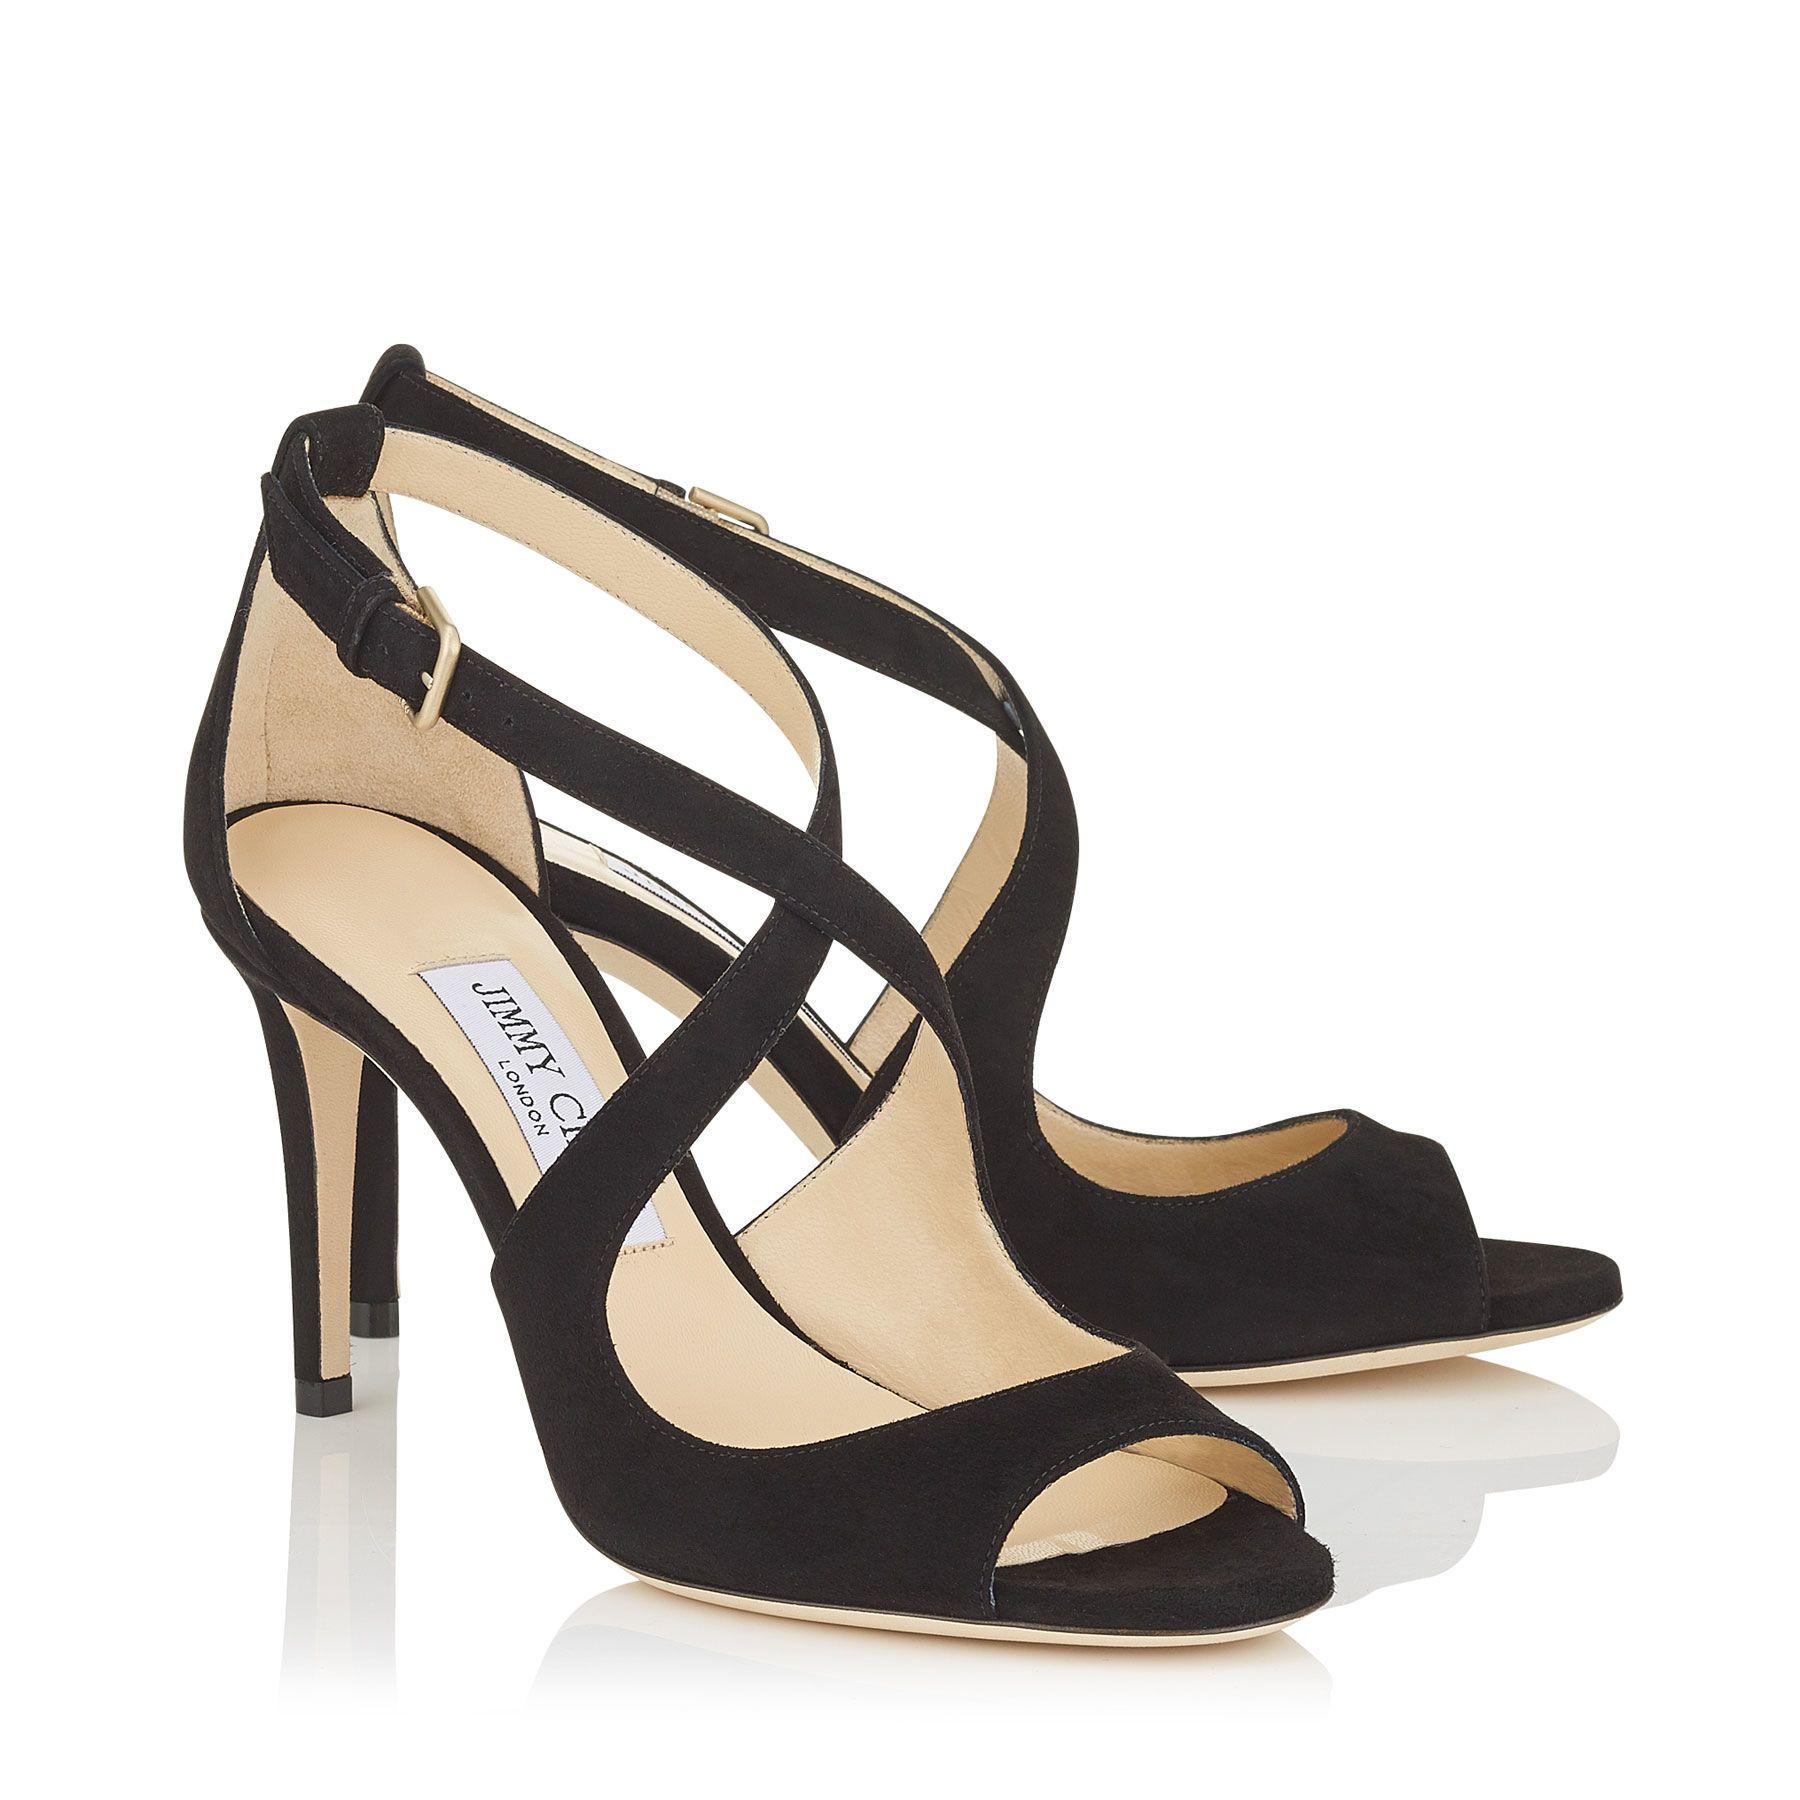 Jimmy Choo EMILY 85 Black Suede Sandals Women